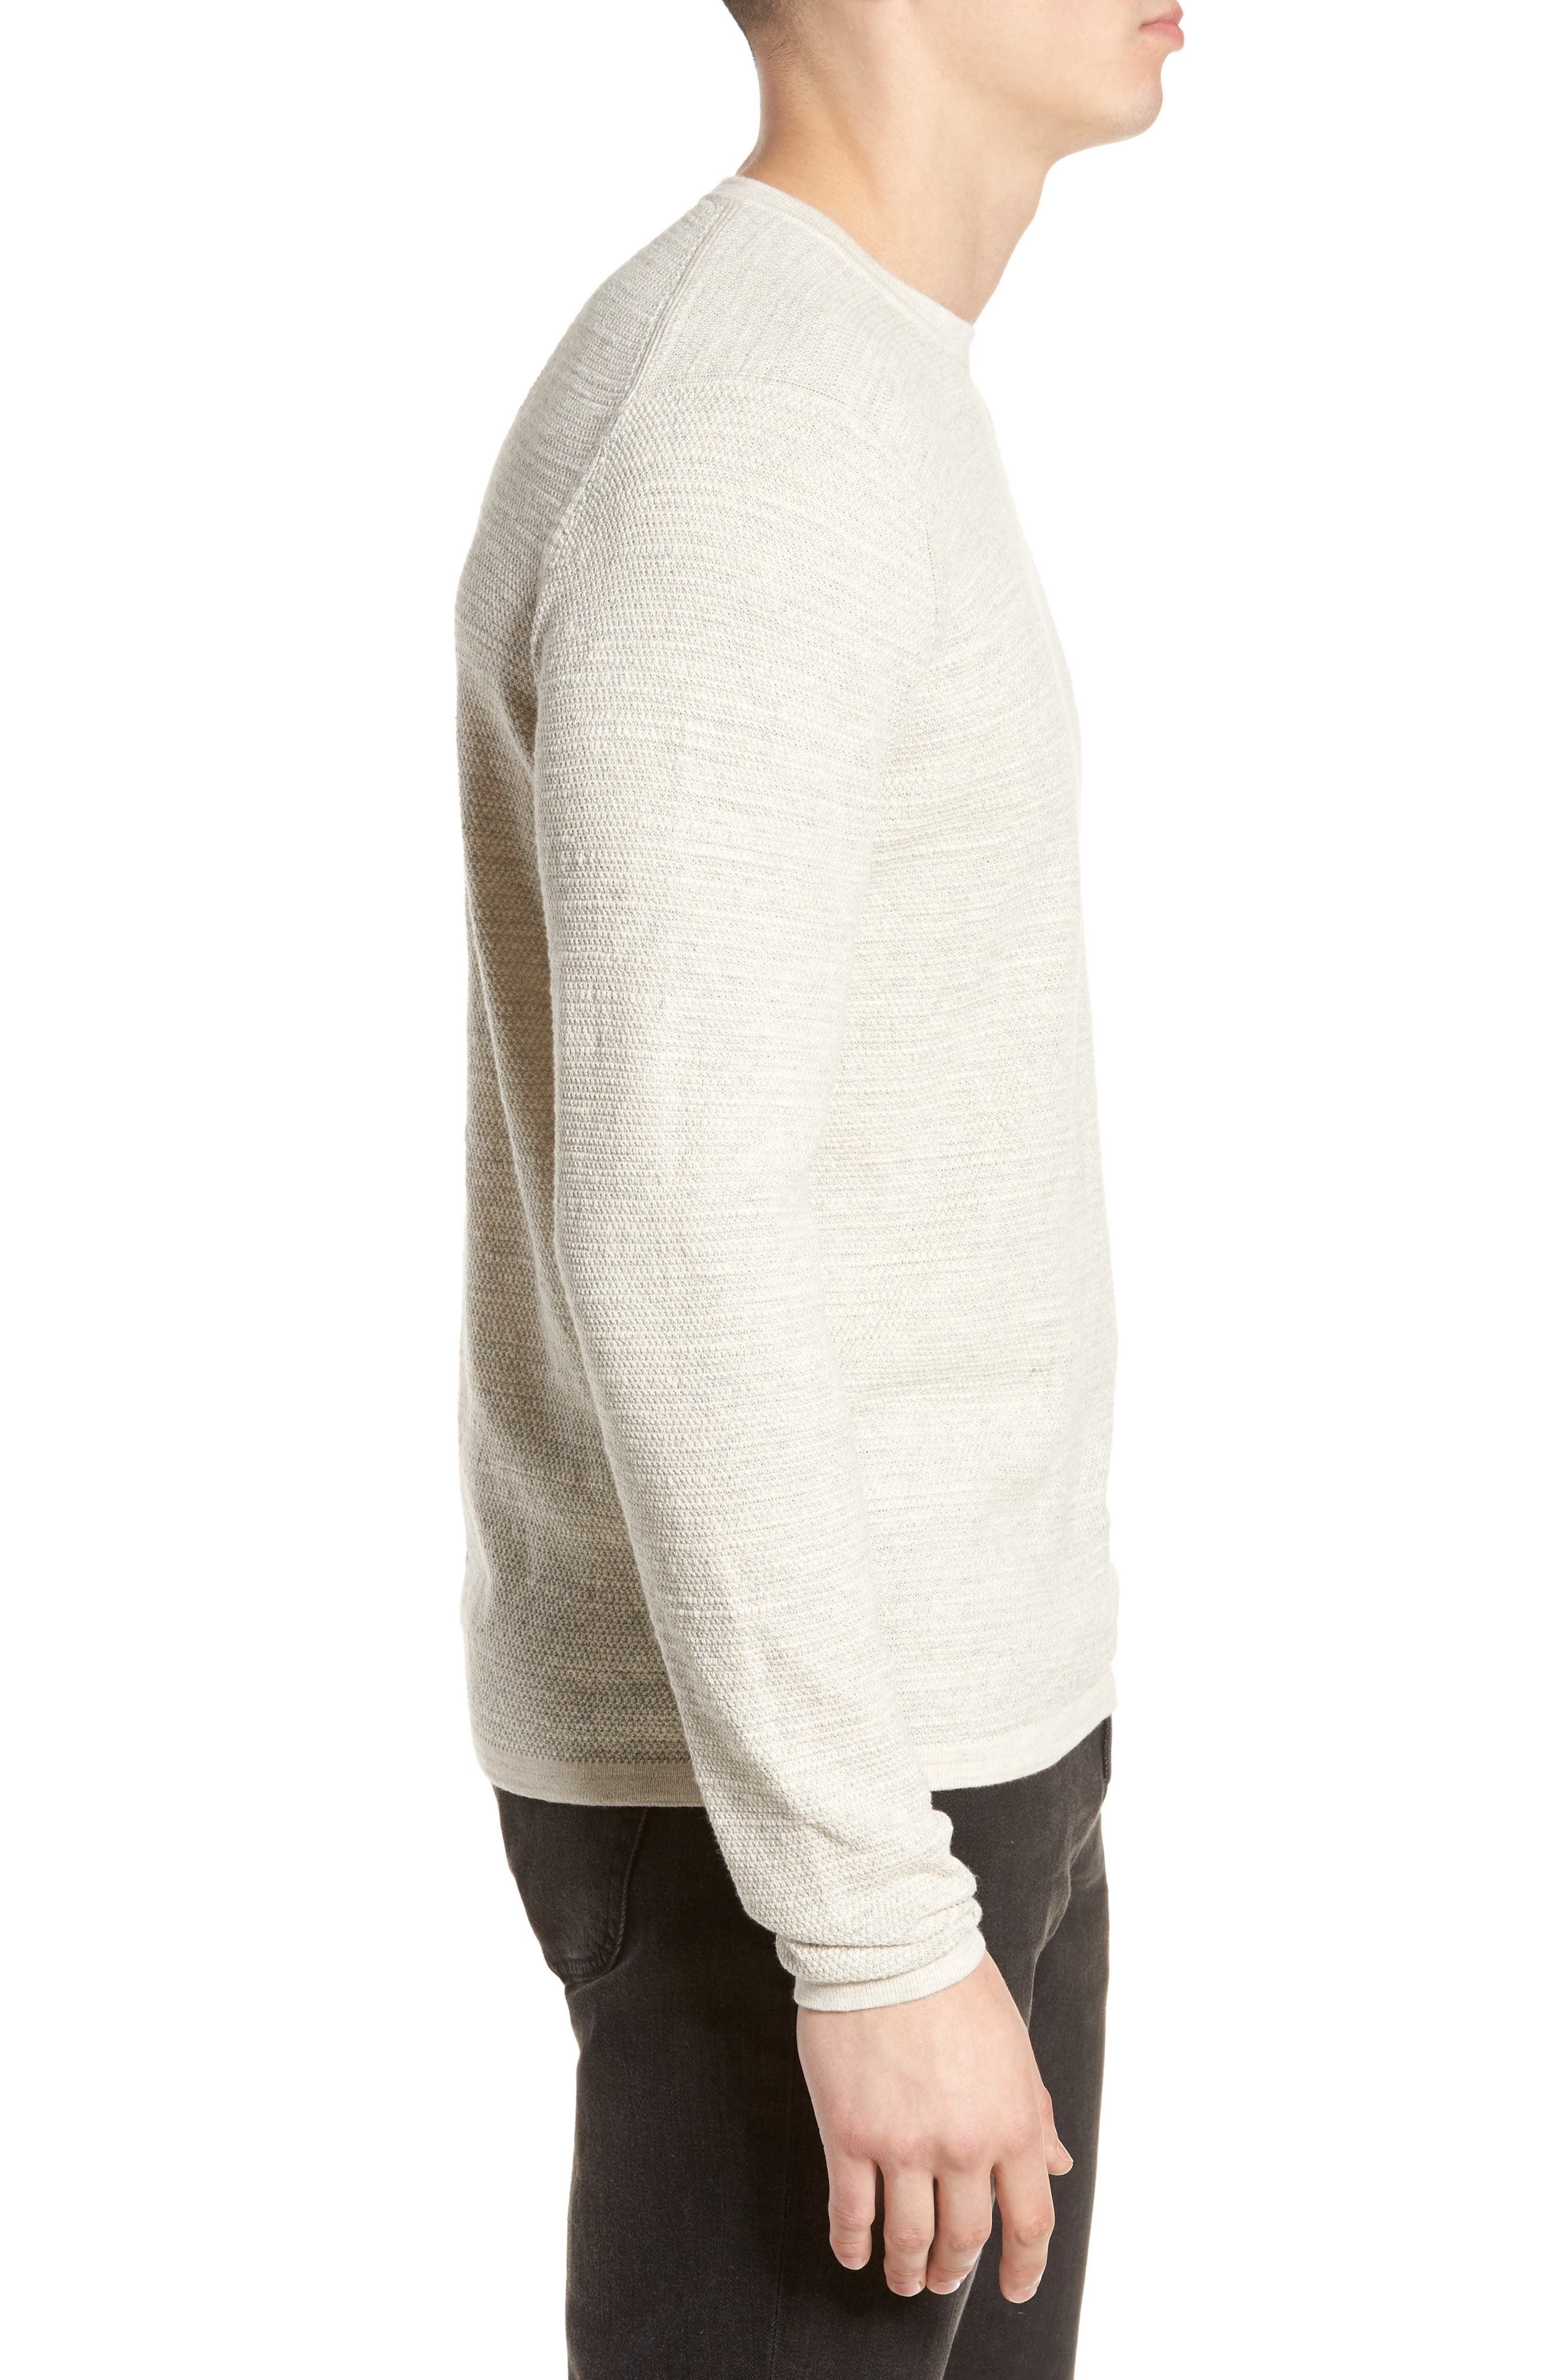 Slub Thermal Knit Sweater,                             Alternate thumbnail 3, color,                             Cream Heather